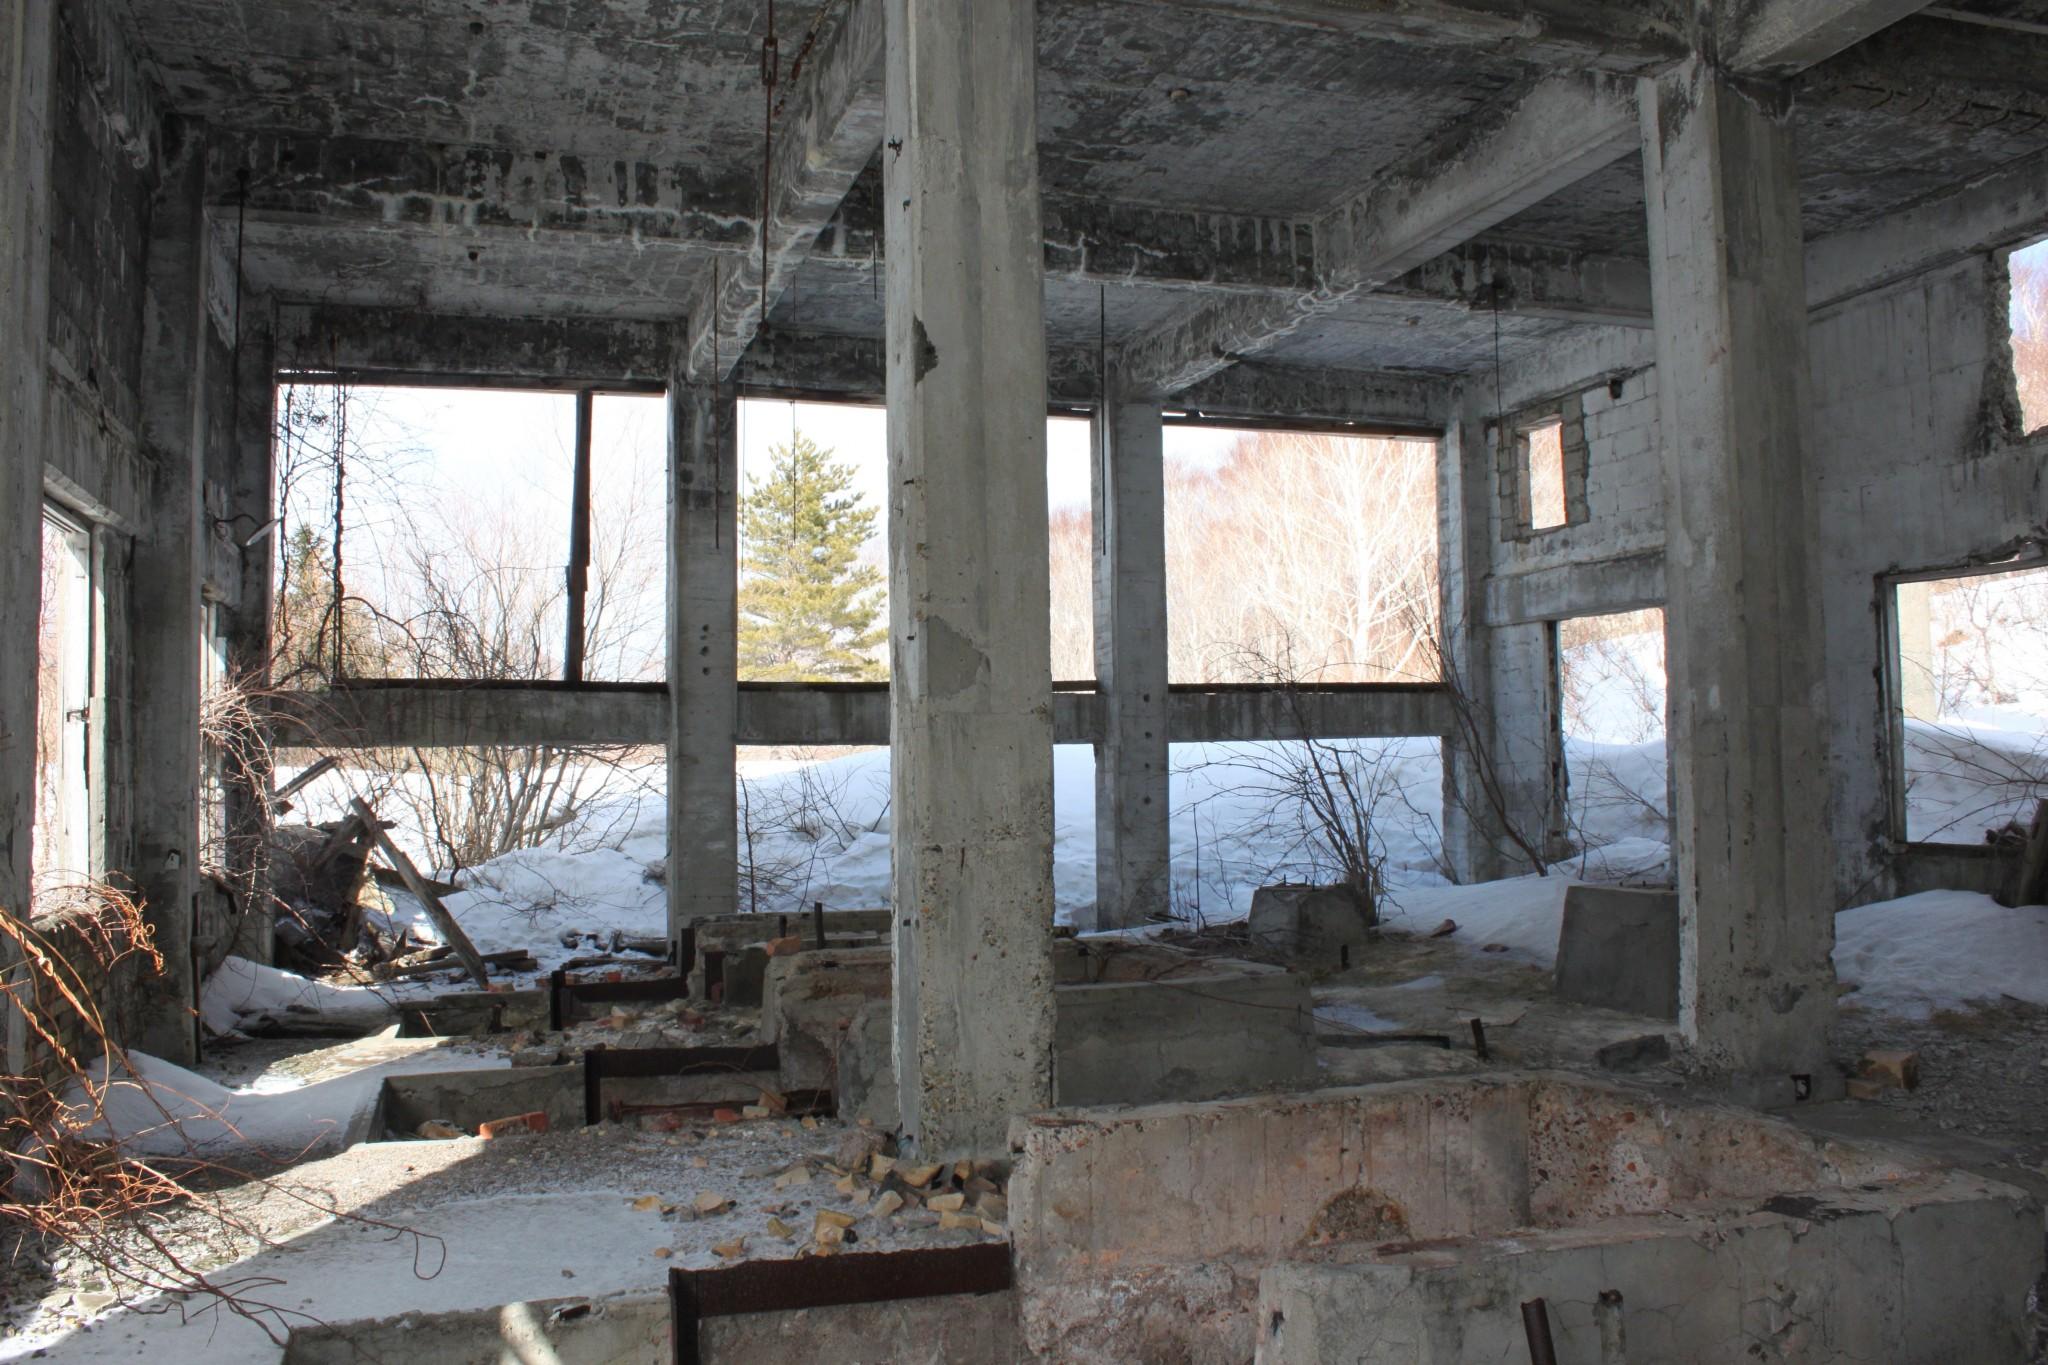 Matsuo Kouzan: The eerie abandoned Matsuo mining town